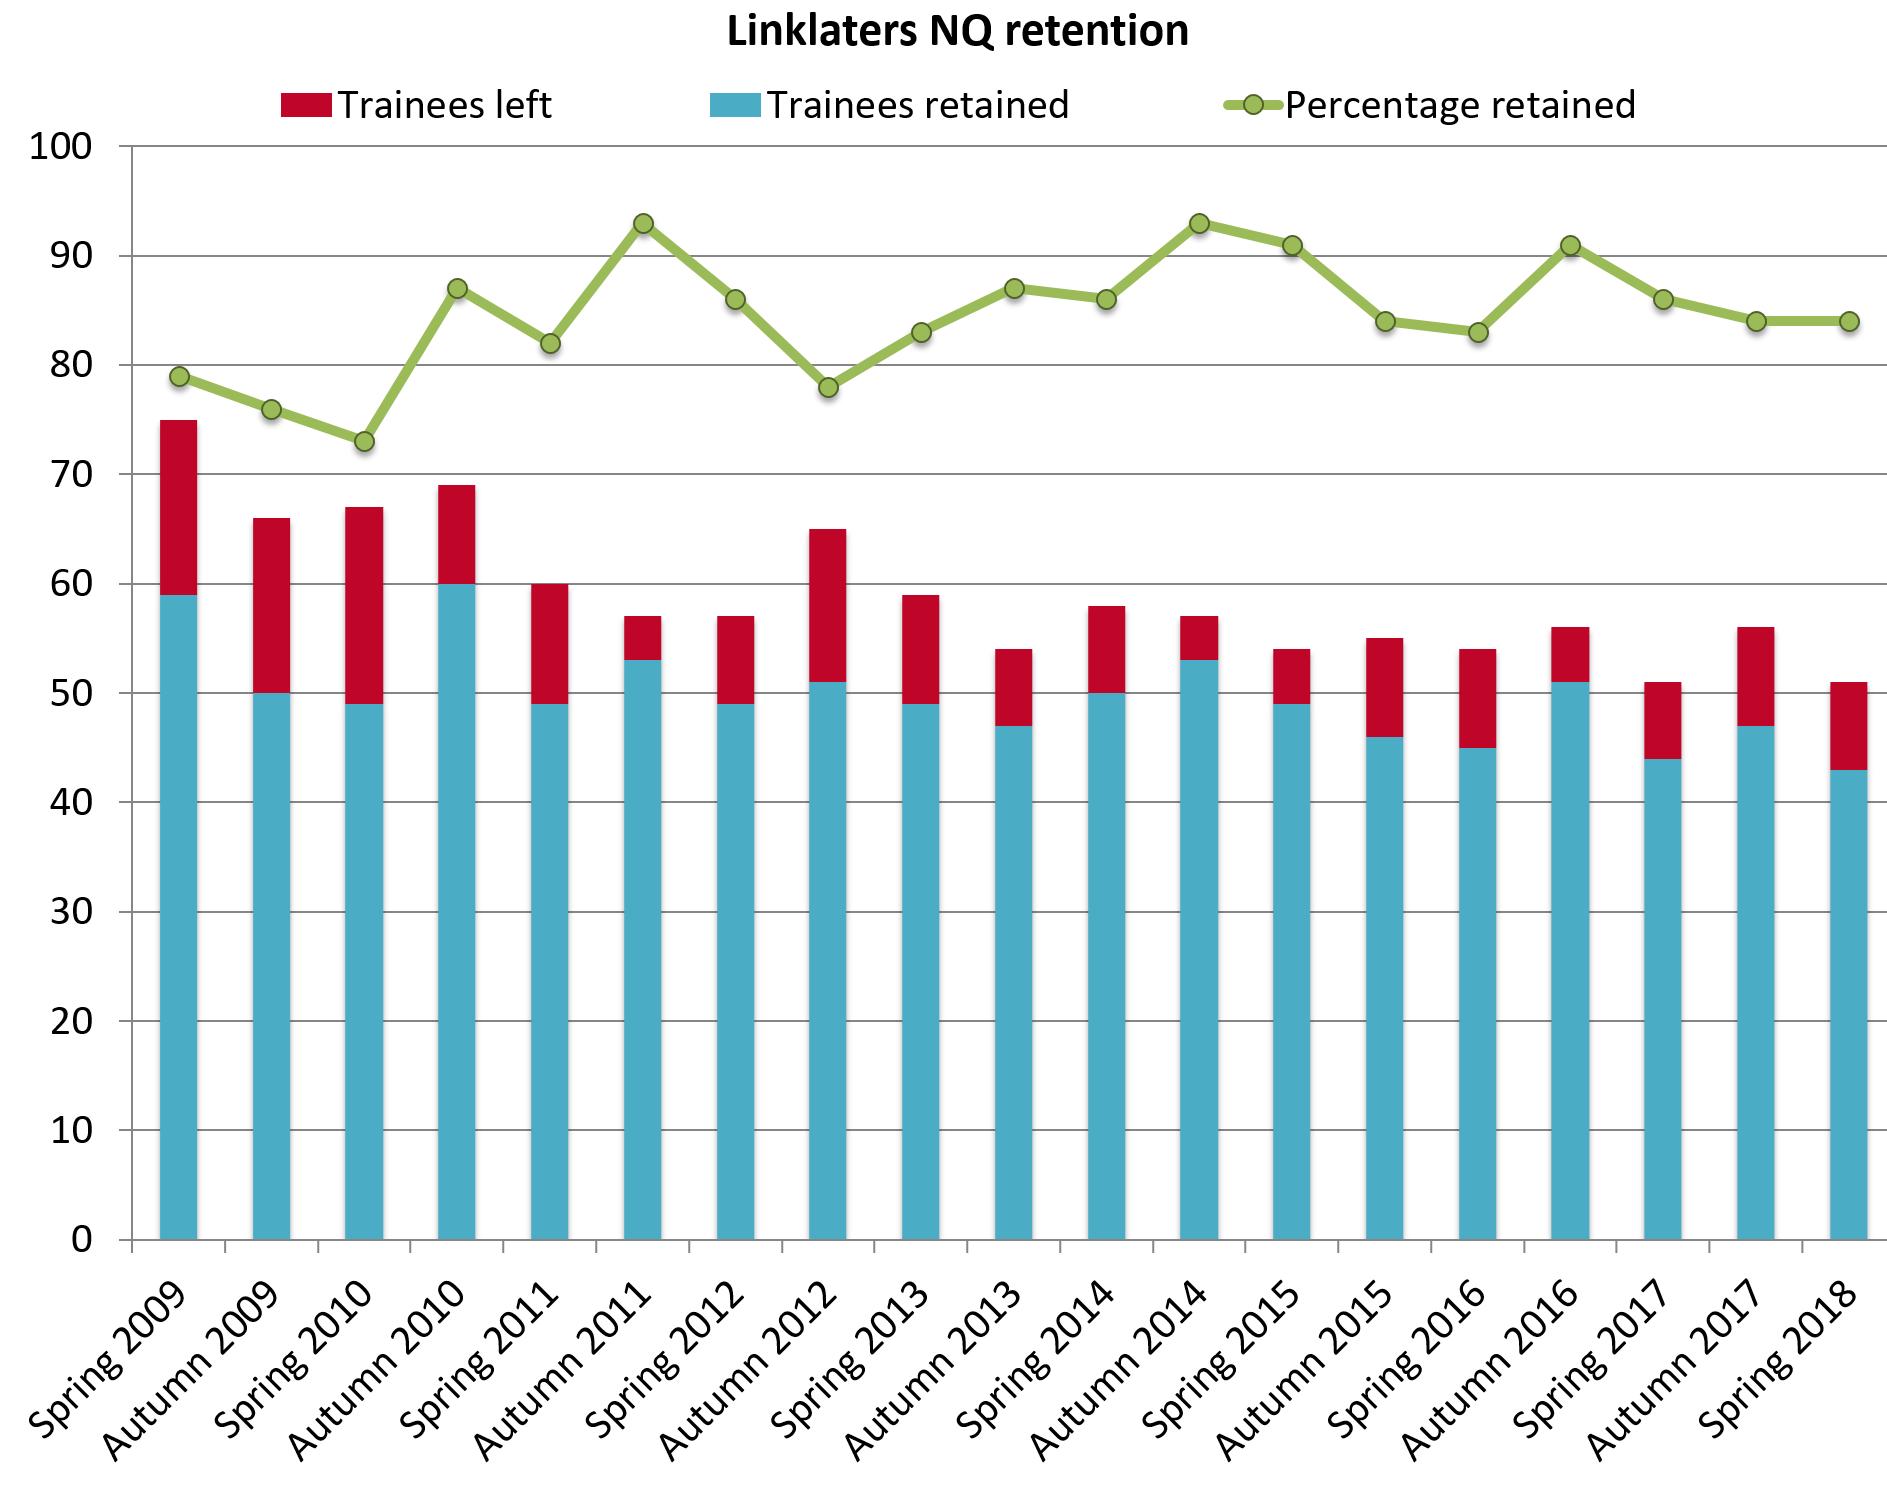 Linklaters retention 2018